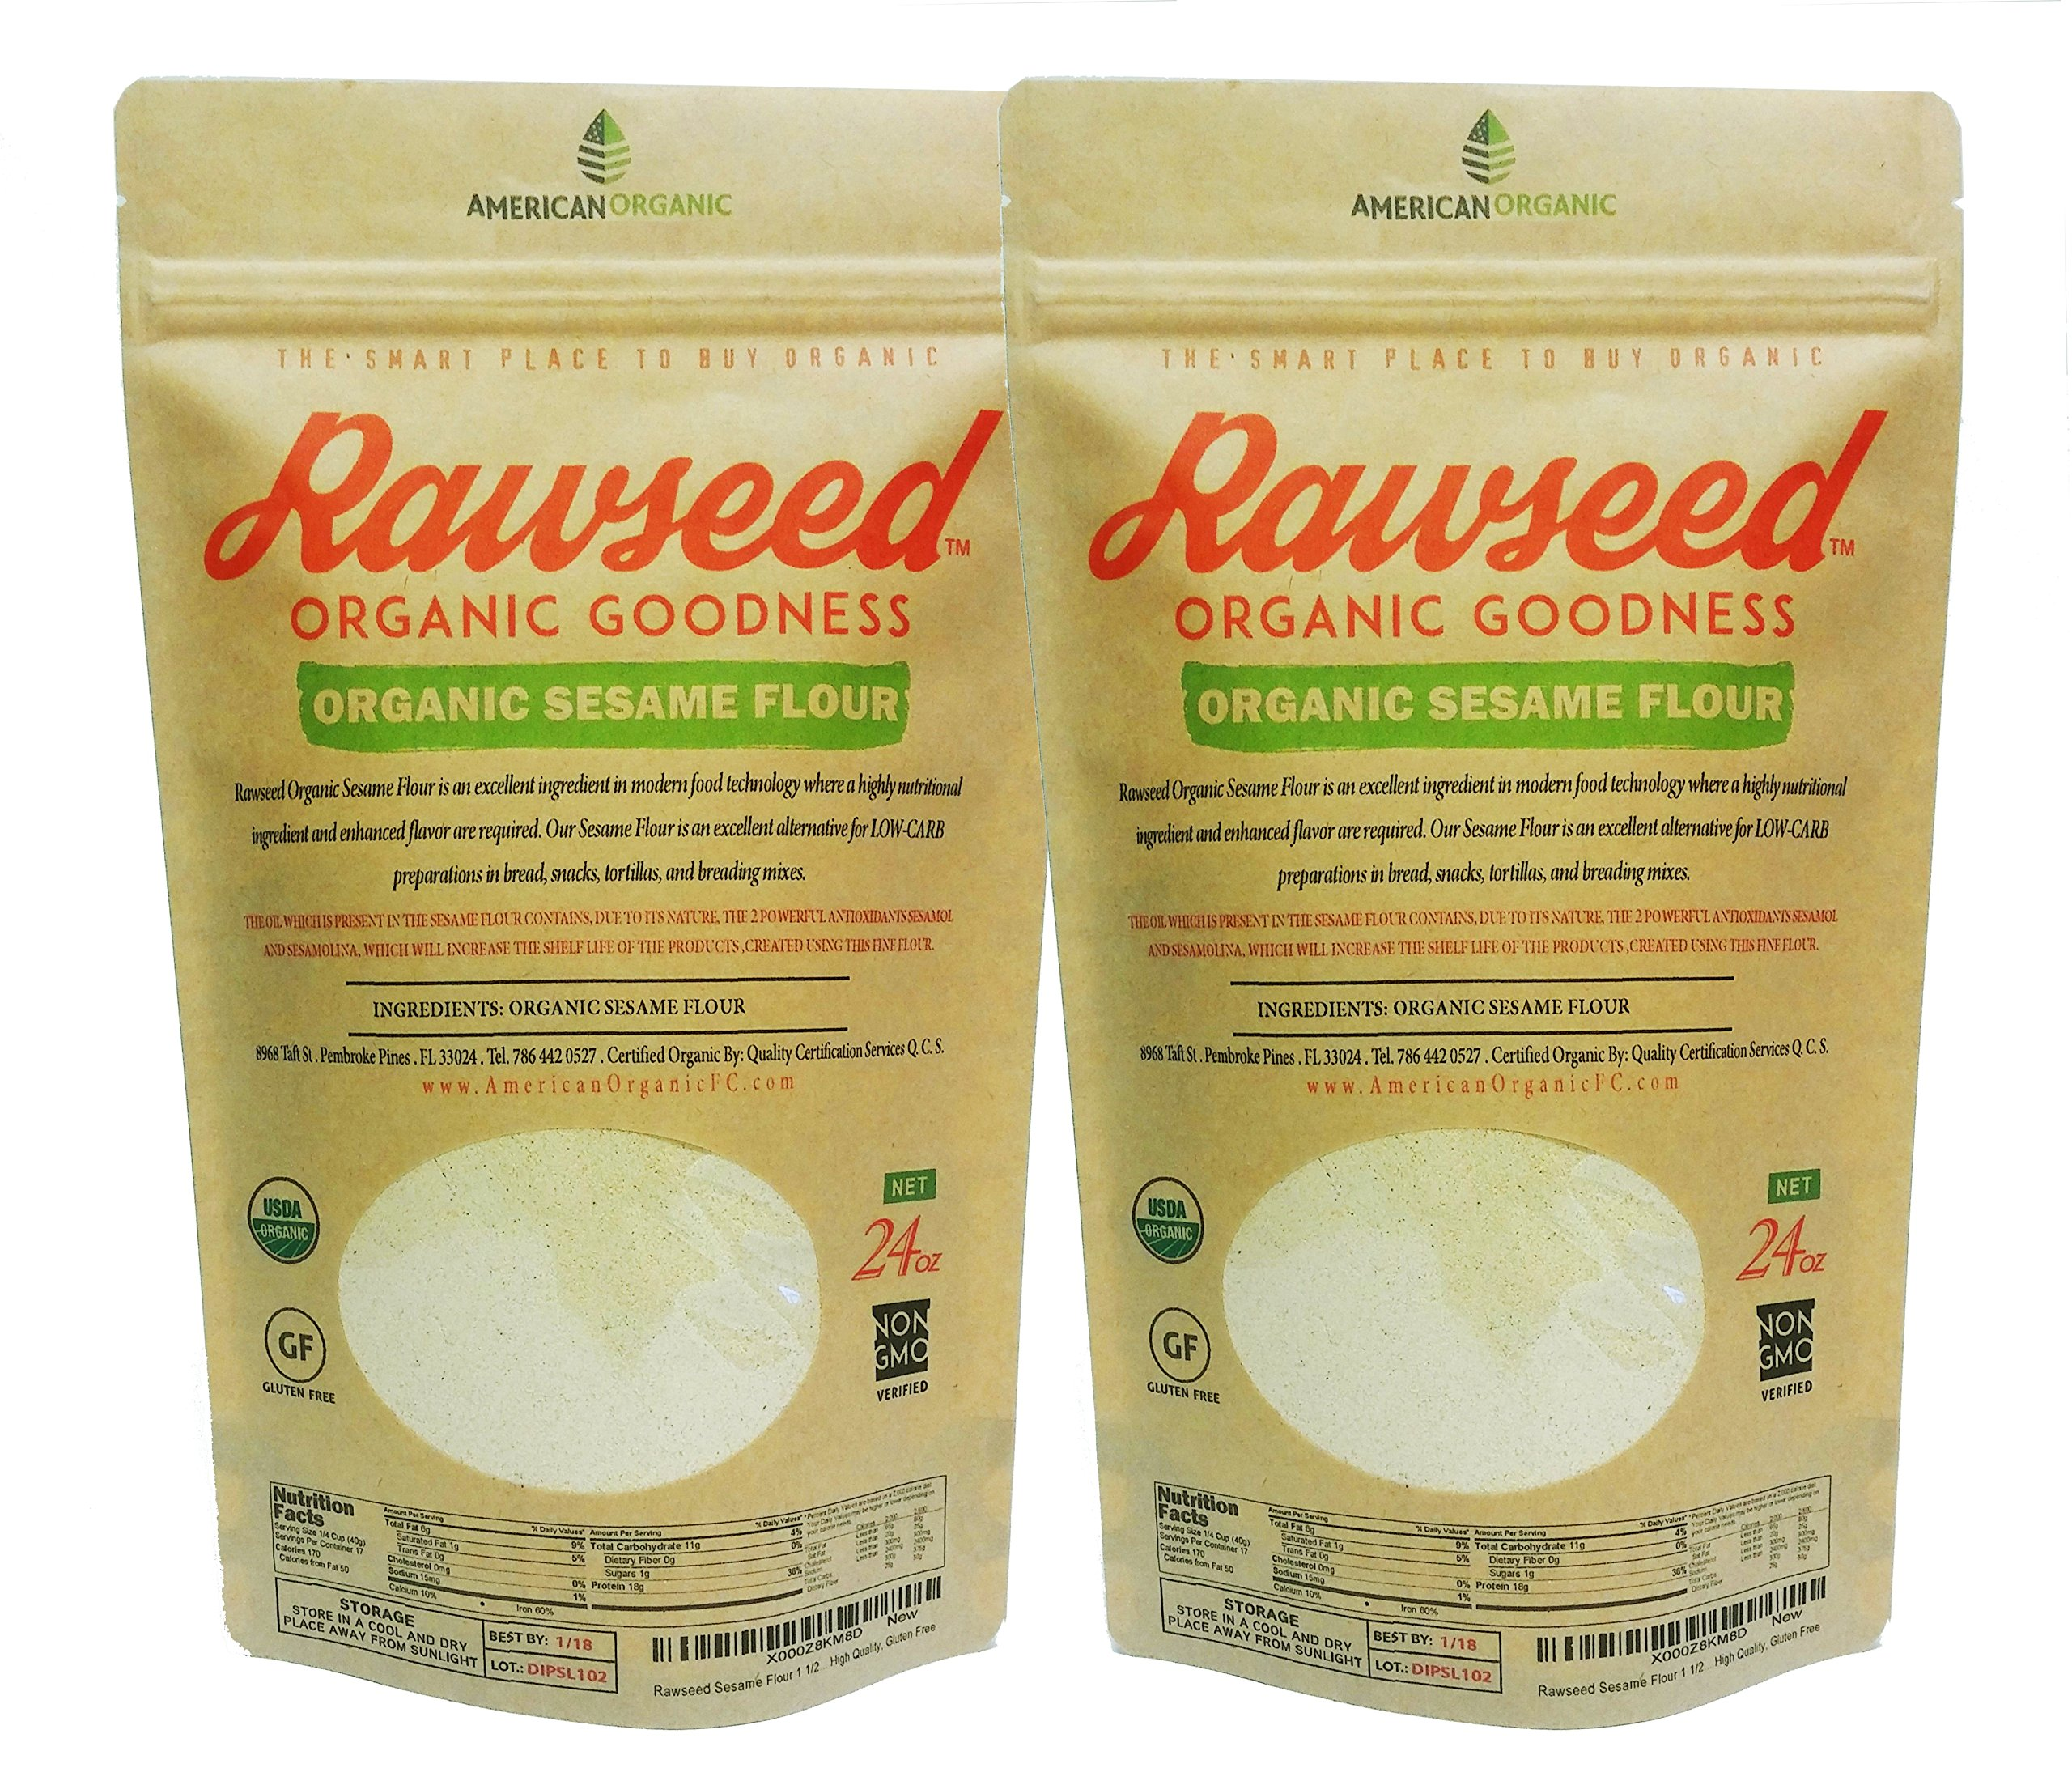 Rawseed Sesame Flour 3 lbs 2 Pack (24 oz) Organic Certifed Natural 100%, Gluten Free by Rawseed Organic Goodness